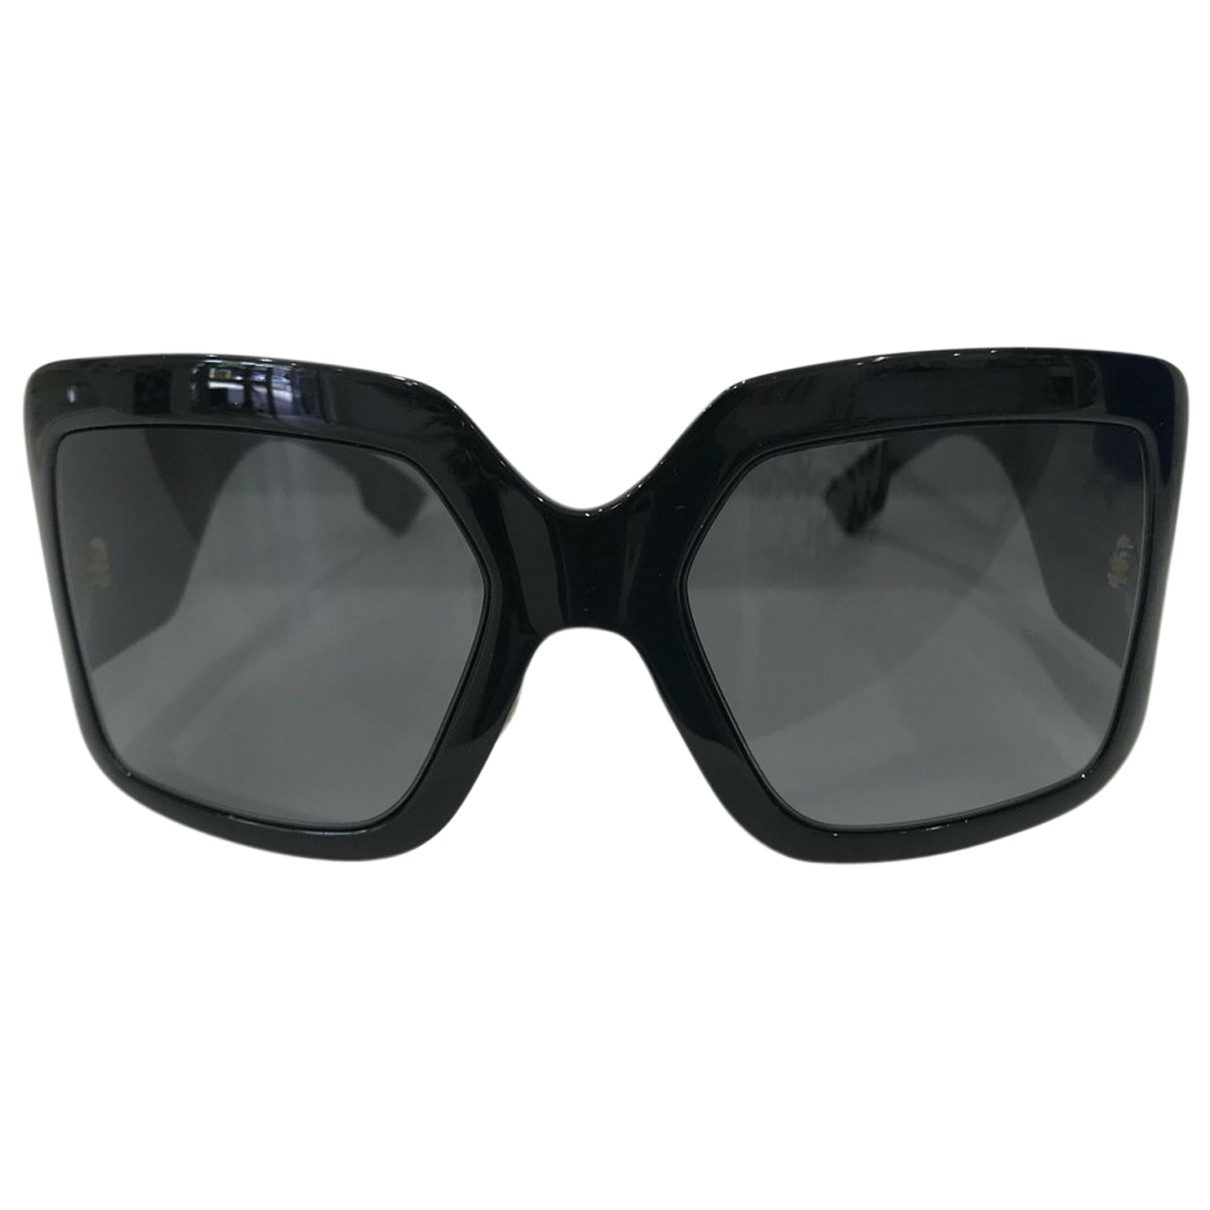 Dior Solight Black Sunglasses for Women N